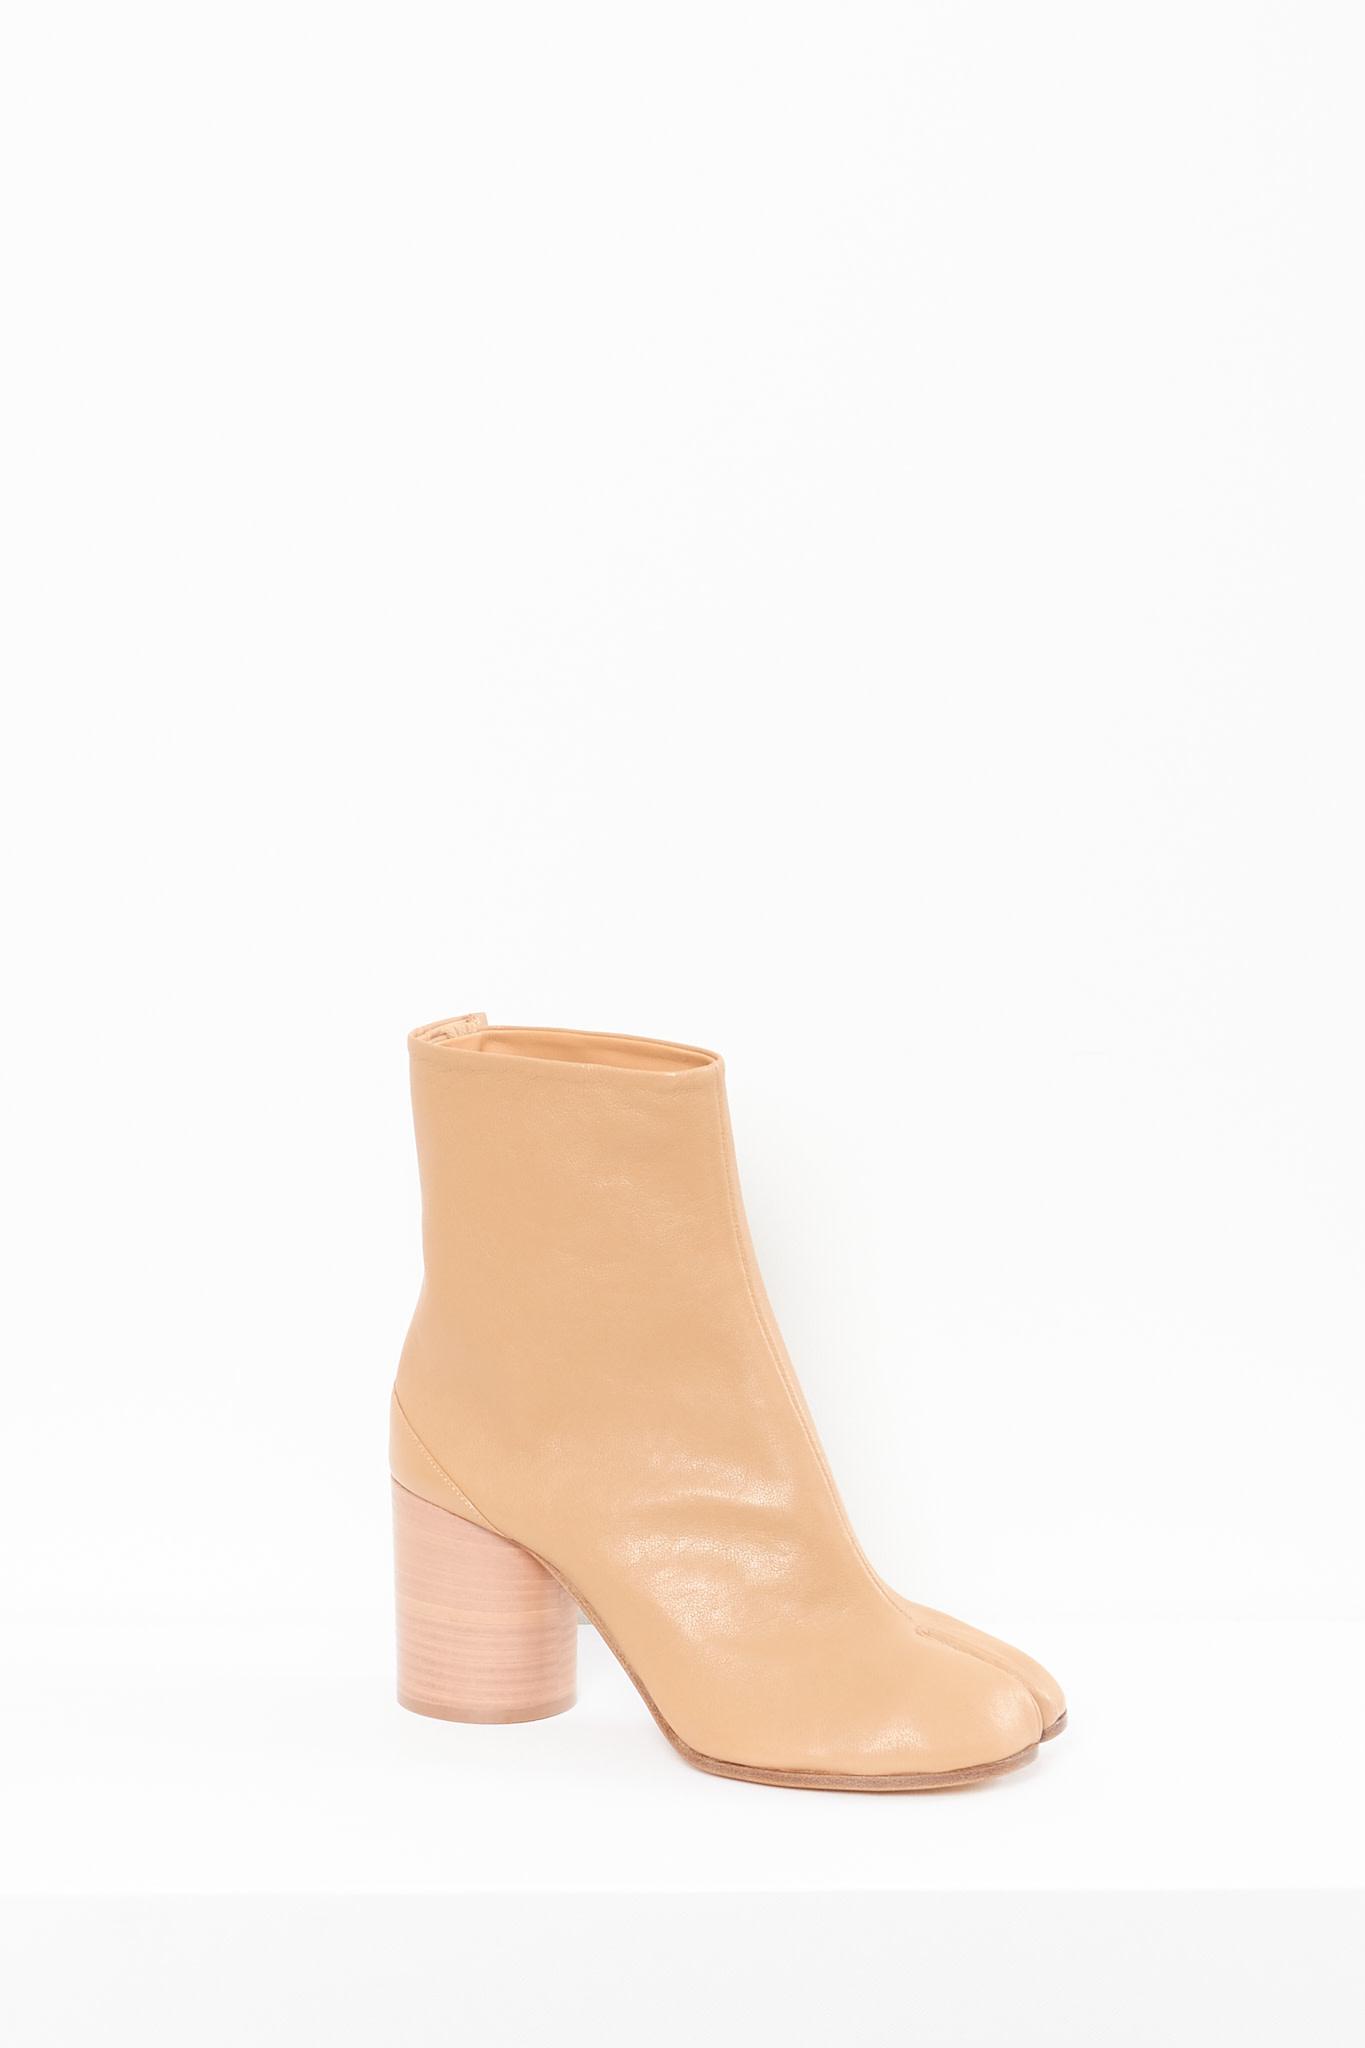 Maison Margiela - MM ankle boot